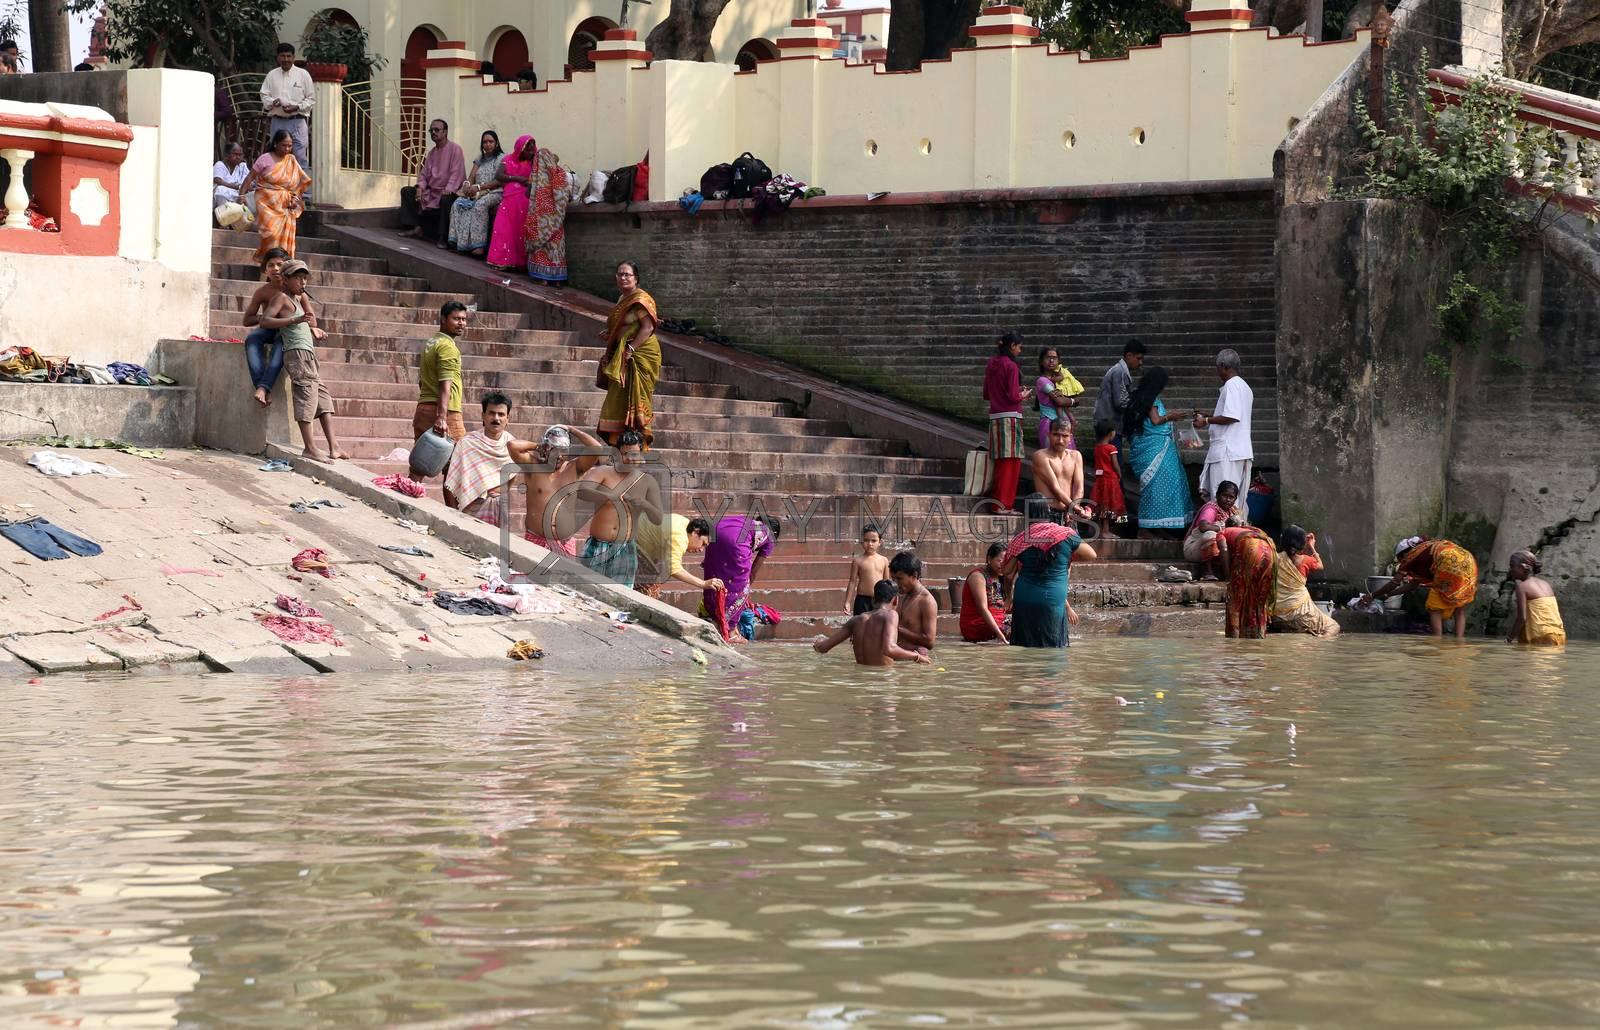 Hindu people bathing in the ghat near the Dakshineswar Kali Temple in Kolkata, West Bengal, India